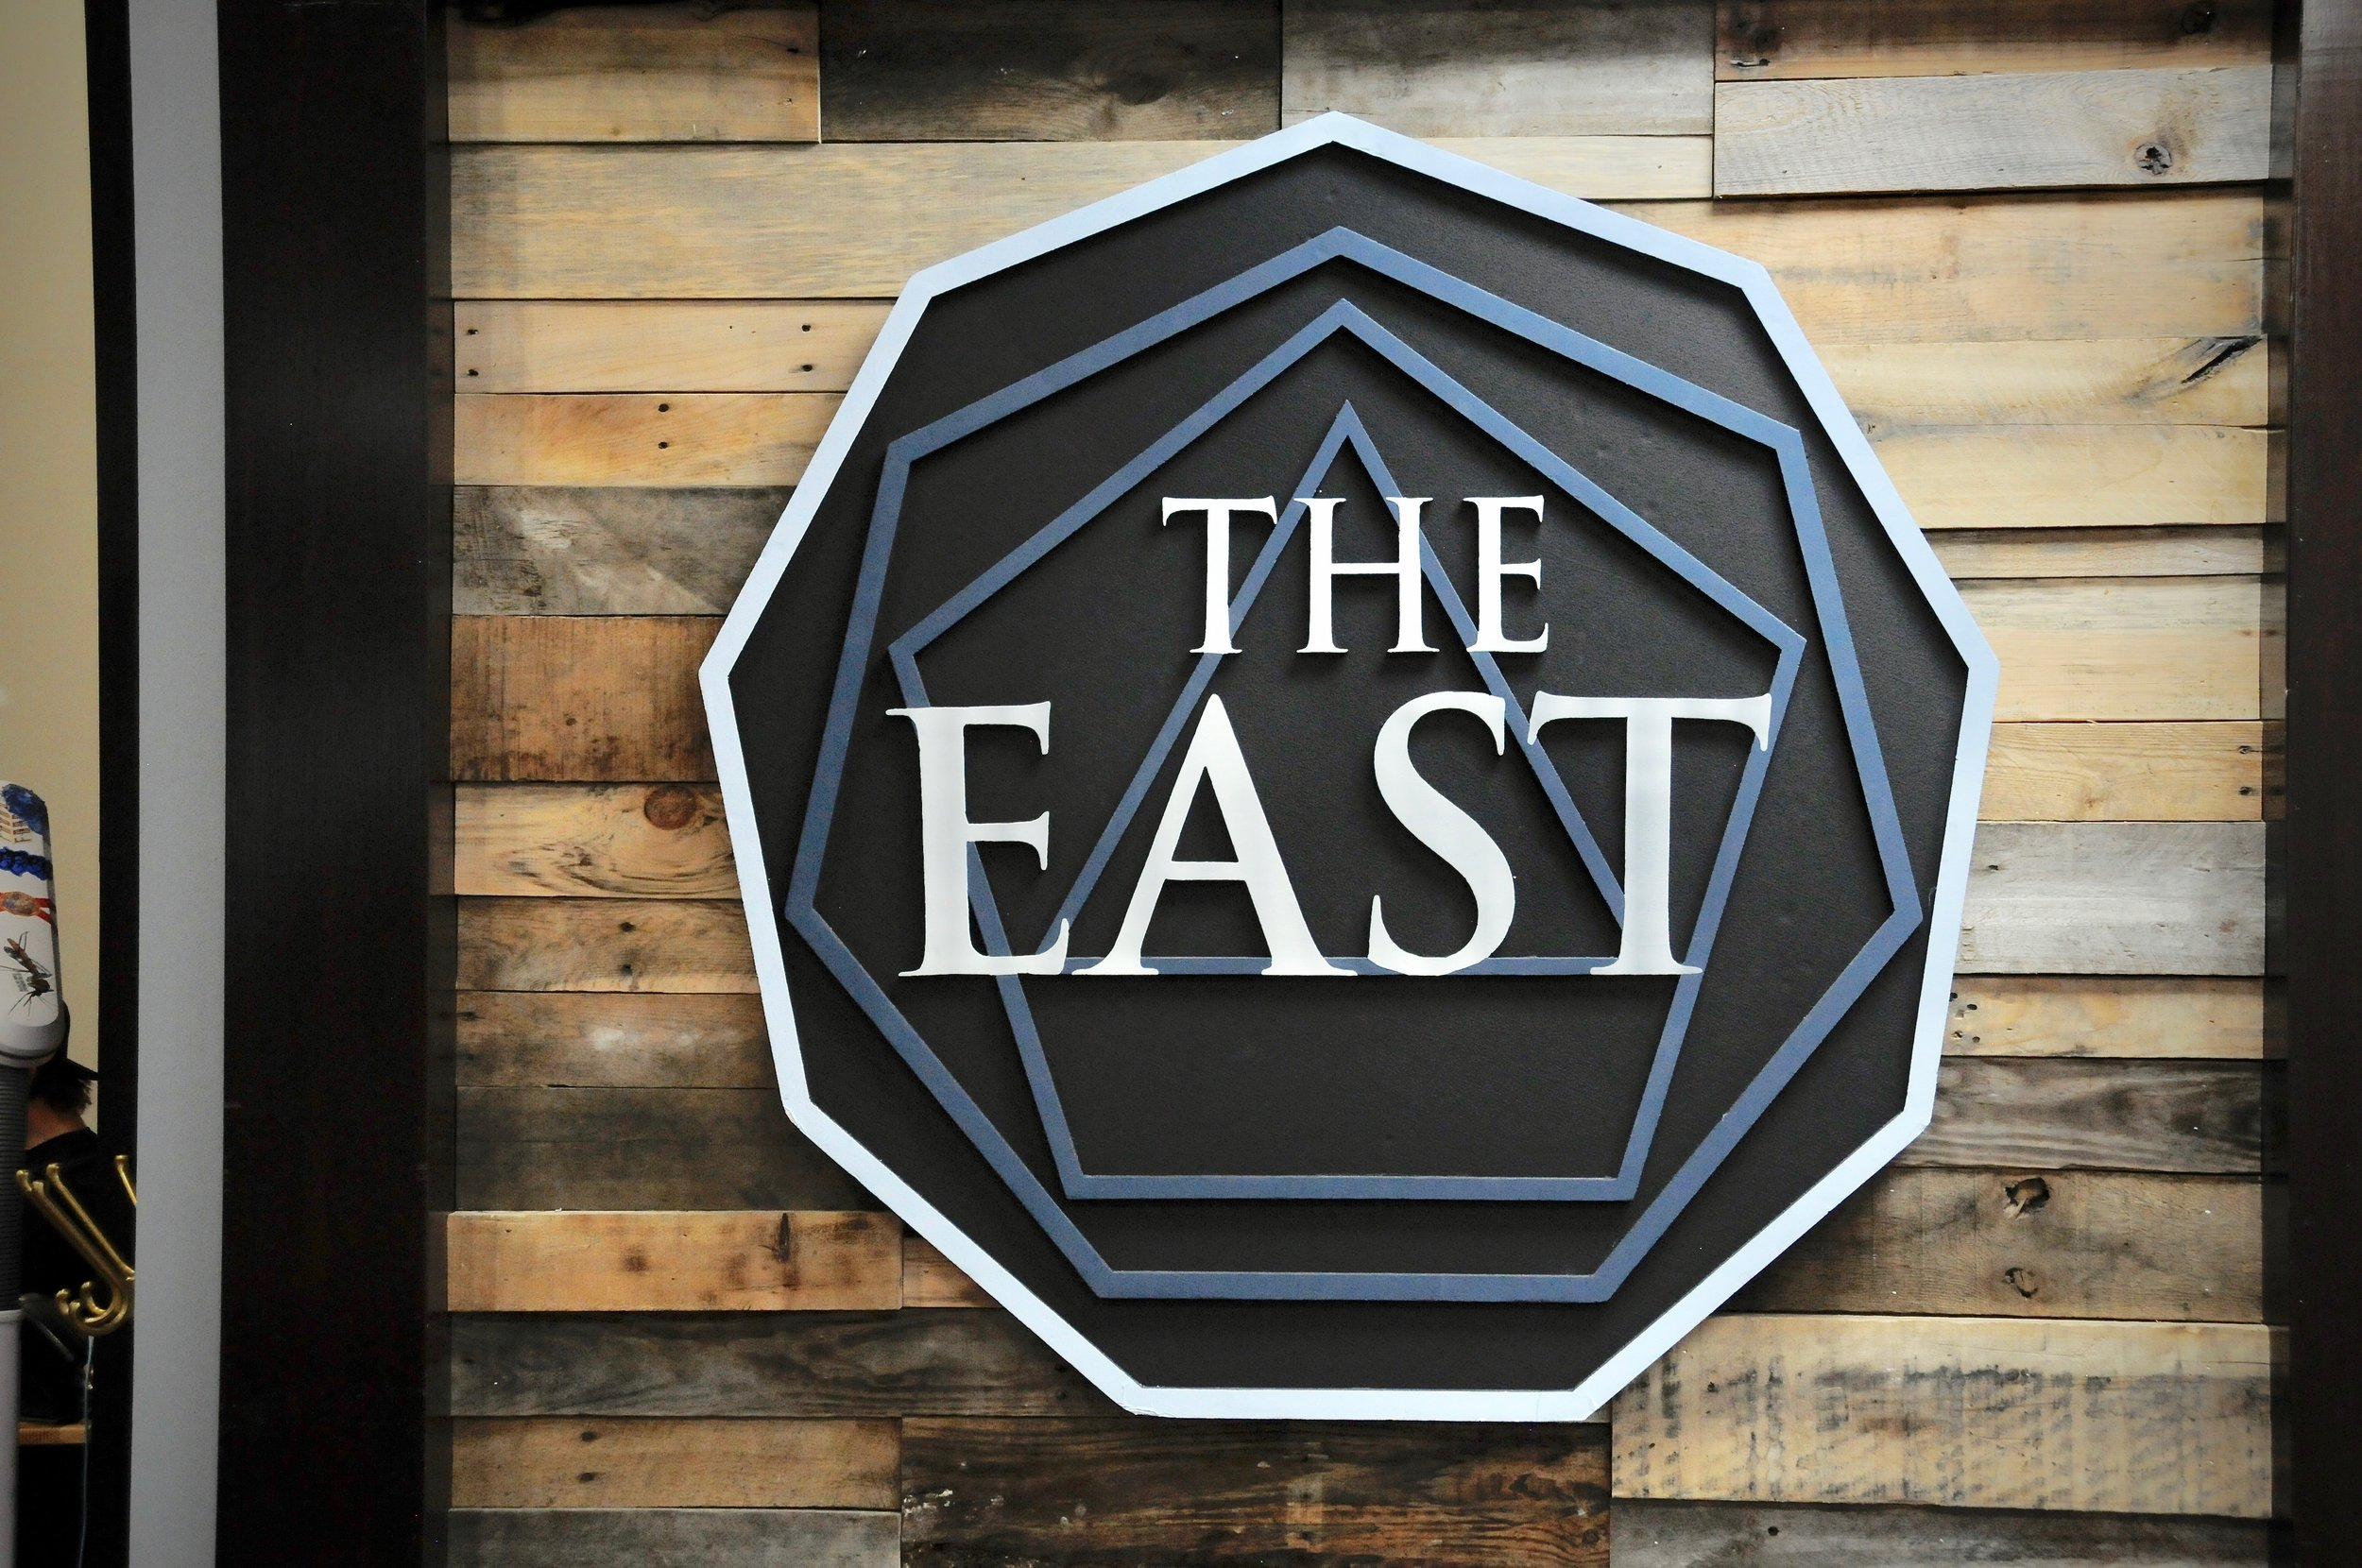 the-east-tattoo---salon-design_43958719704_o.jpg